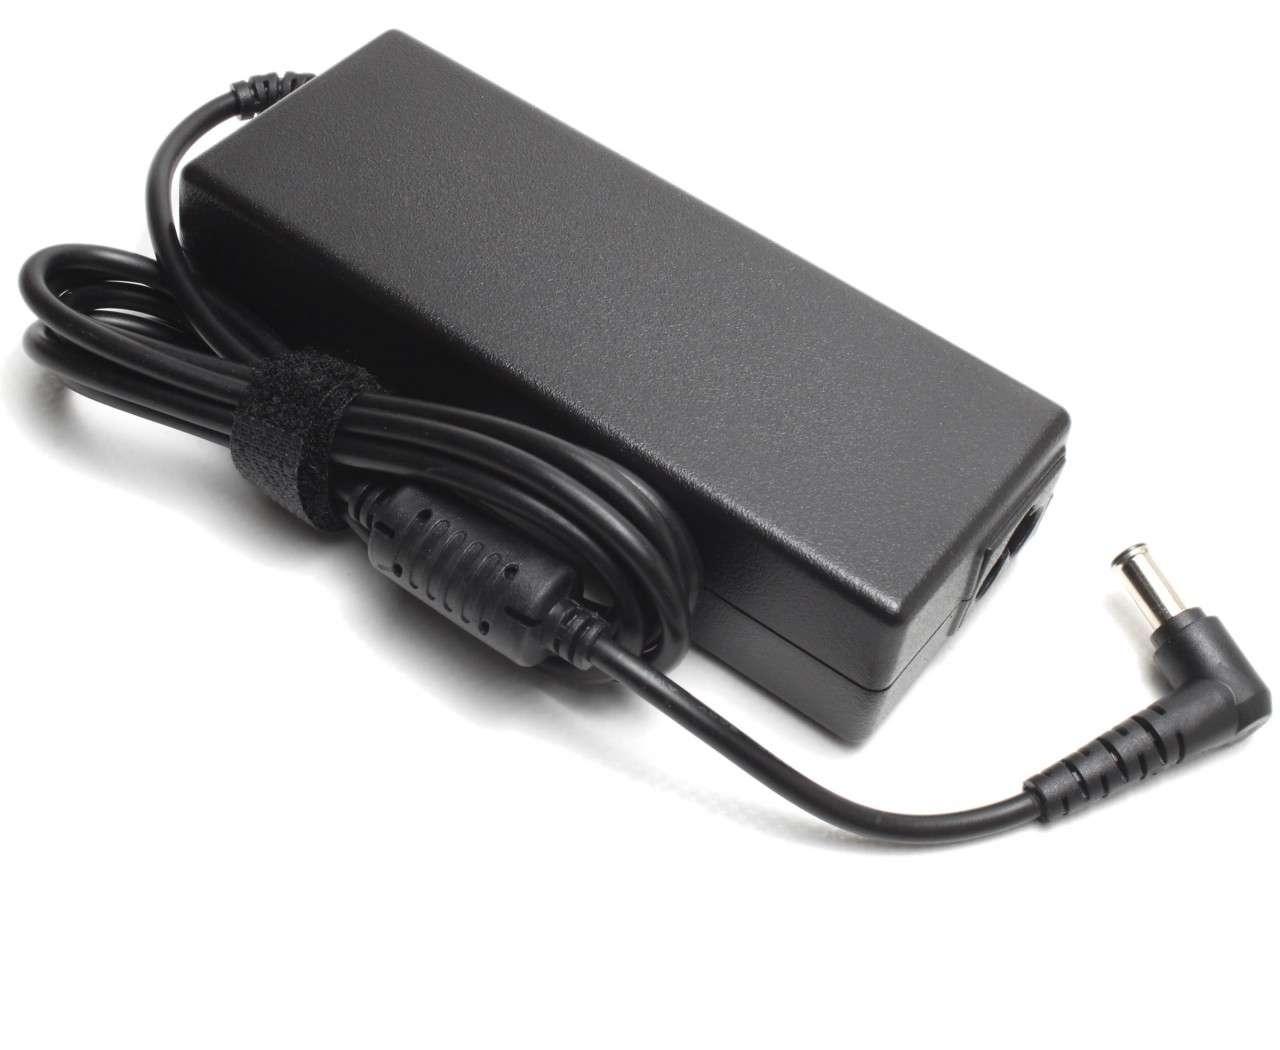 Incarcator Sony Vaio PCG A517M Replacement imagine powerlaptop.ro 2021